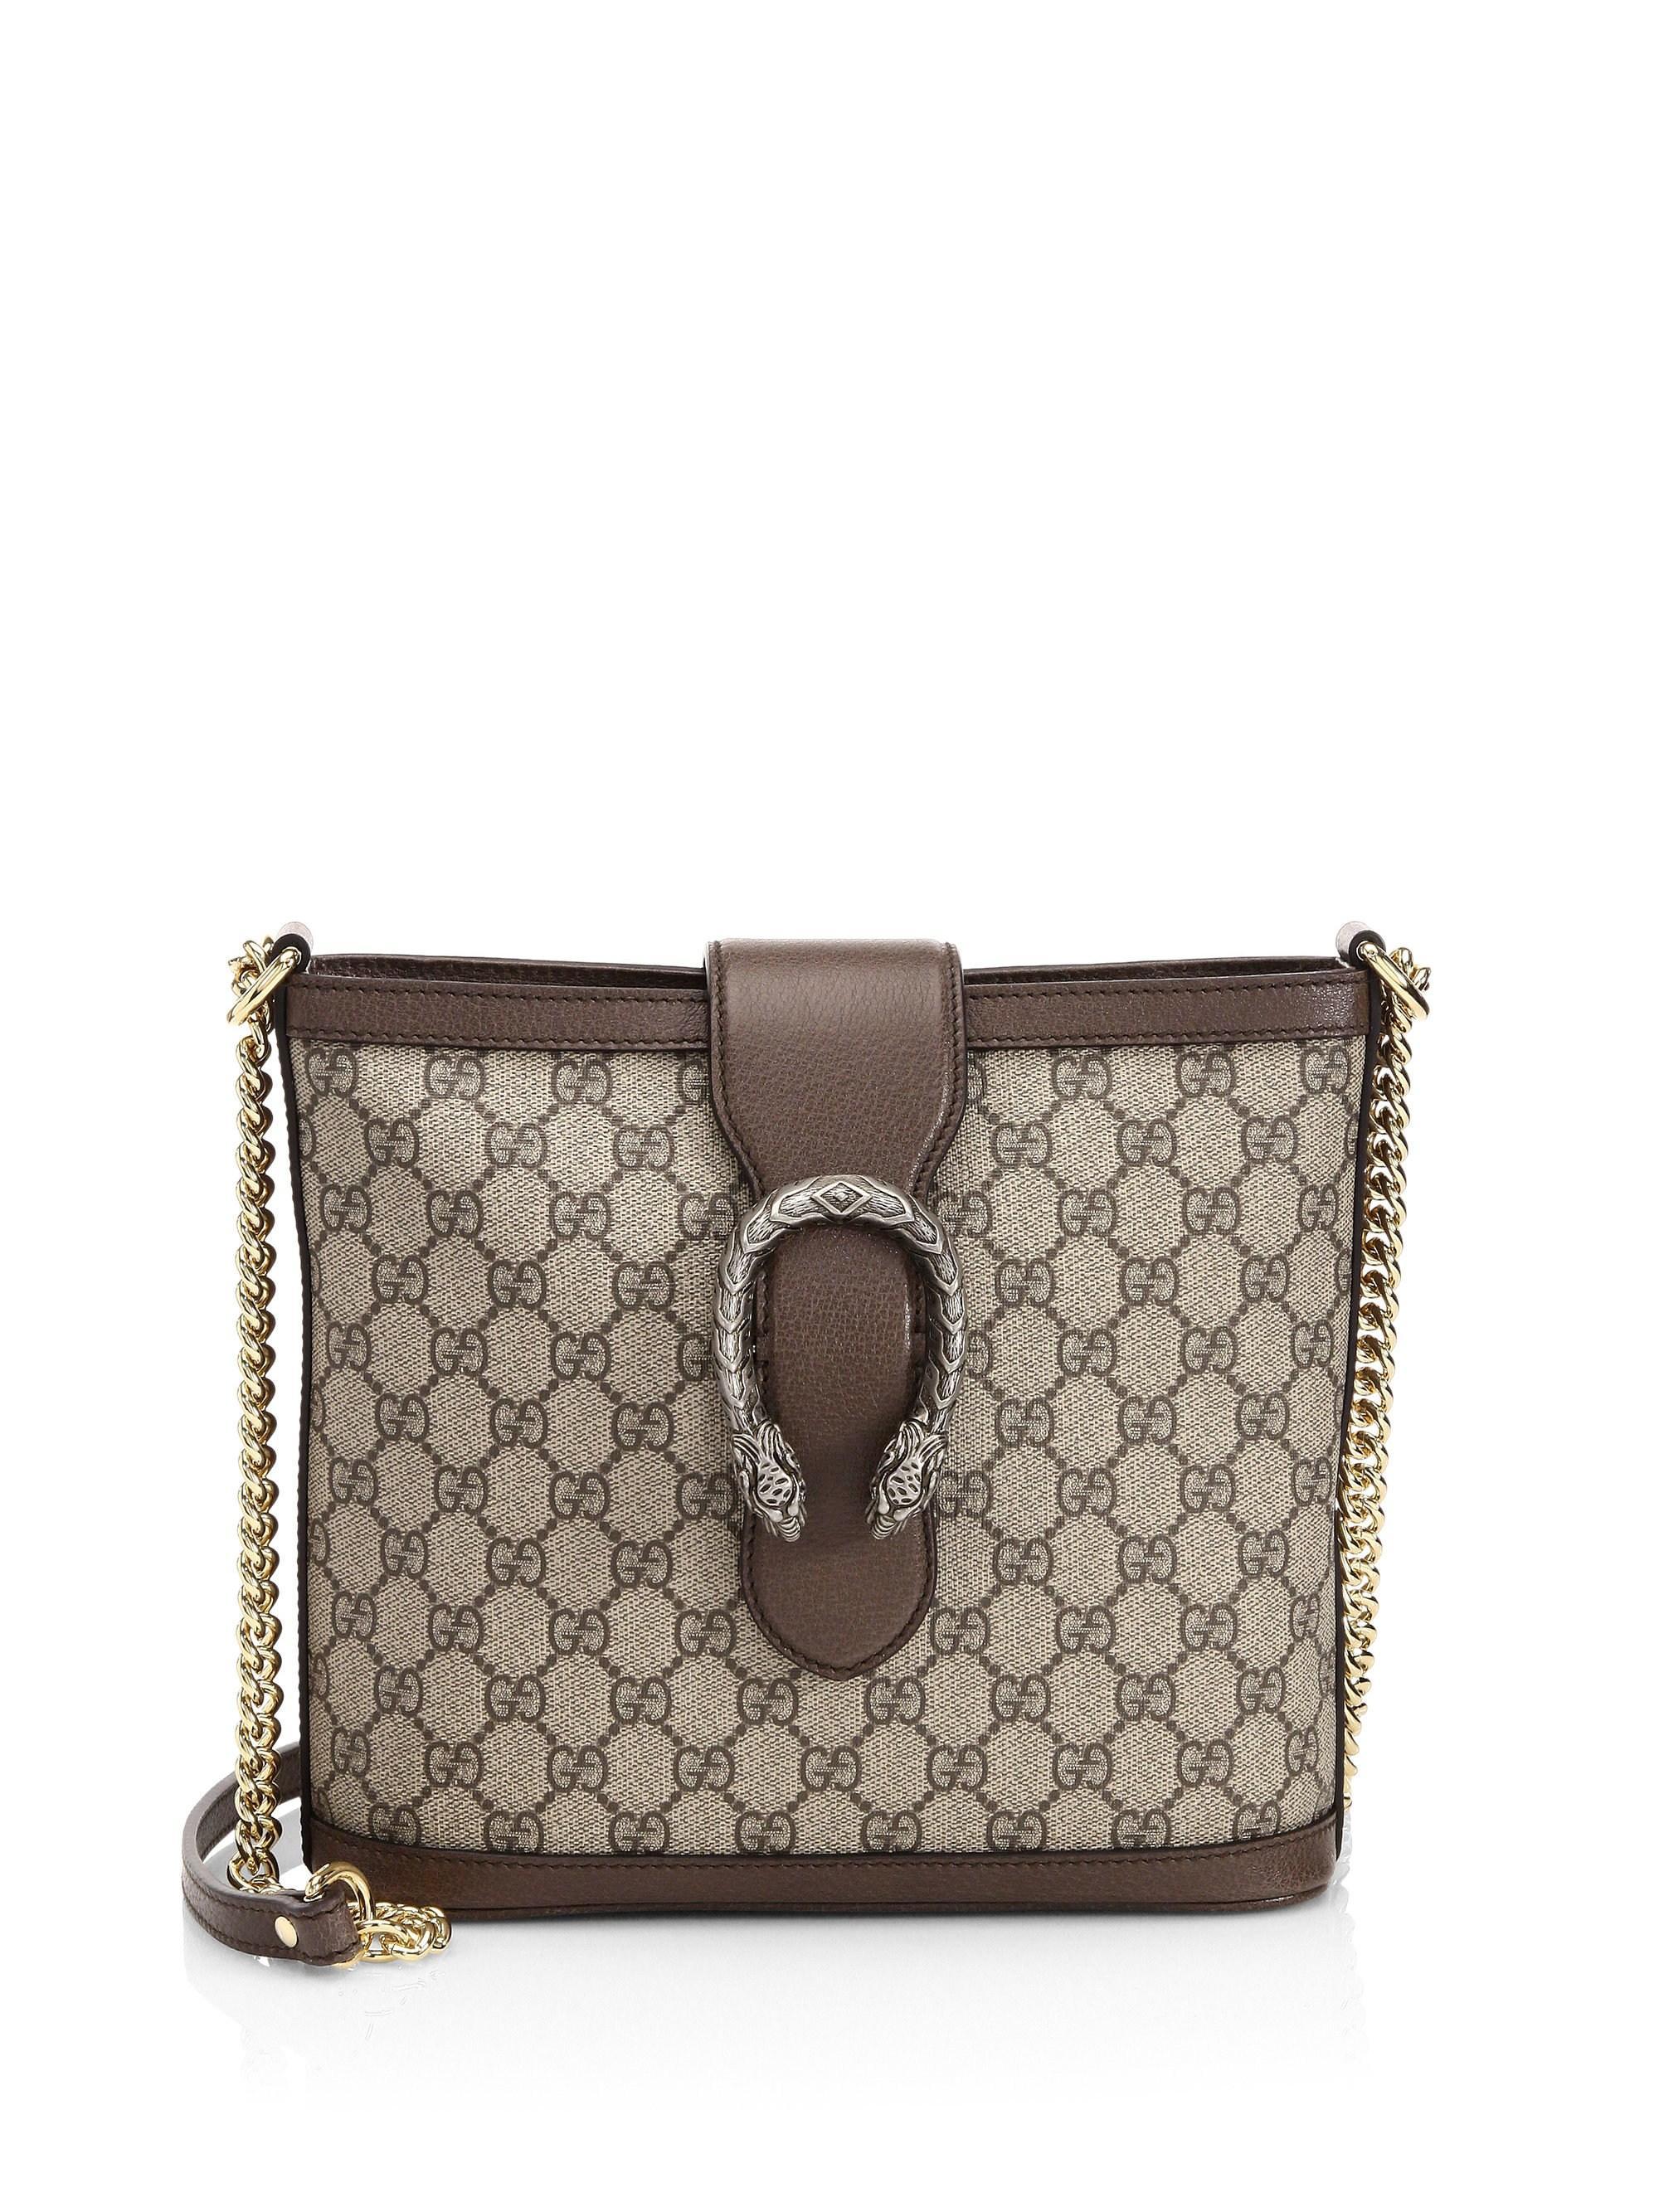 2a5d5e50362f13 Gucci Women's Dionysus GG Supreme Medium Bucket Bag - Beige Multi - Lyst